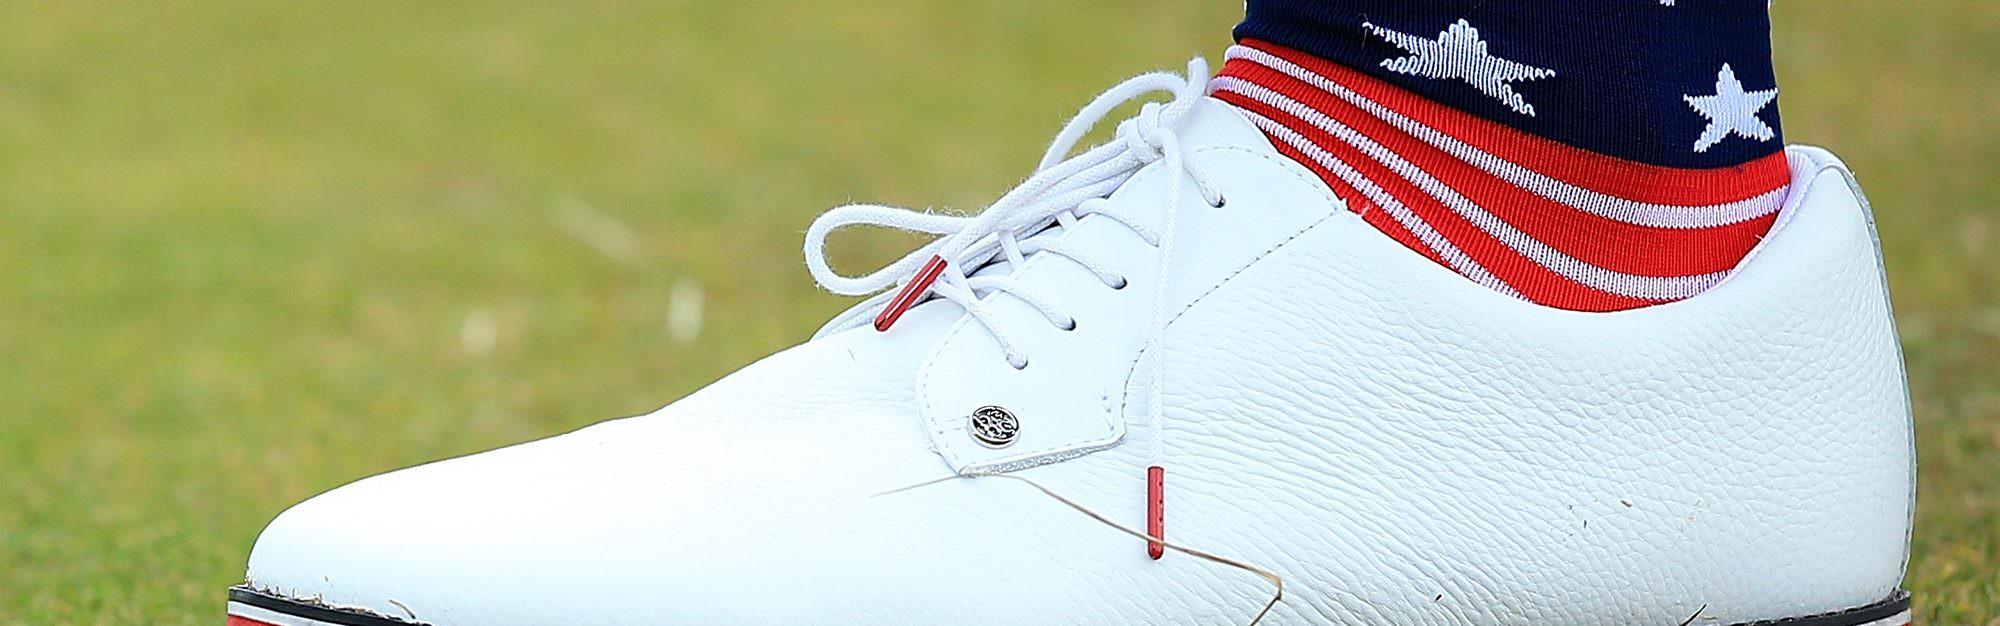 Treat your feet: The best golf socks of 2020